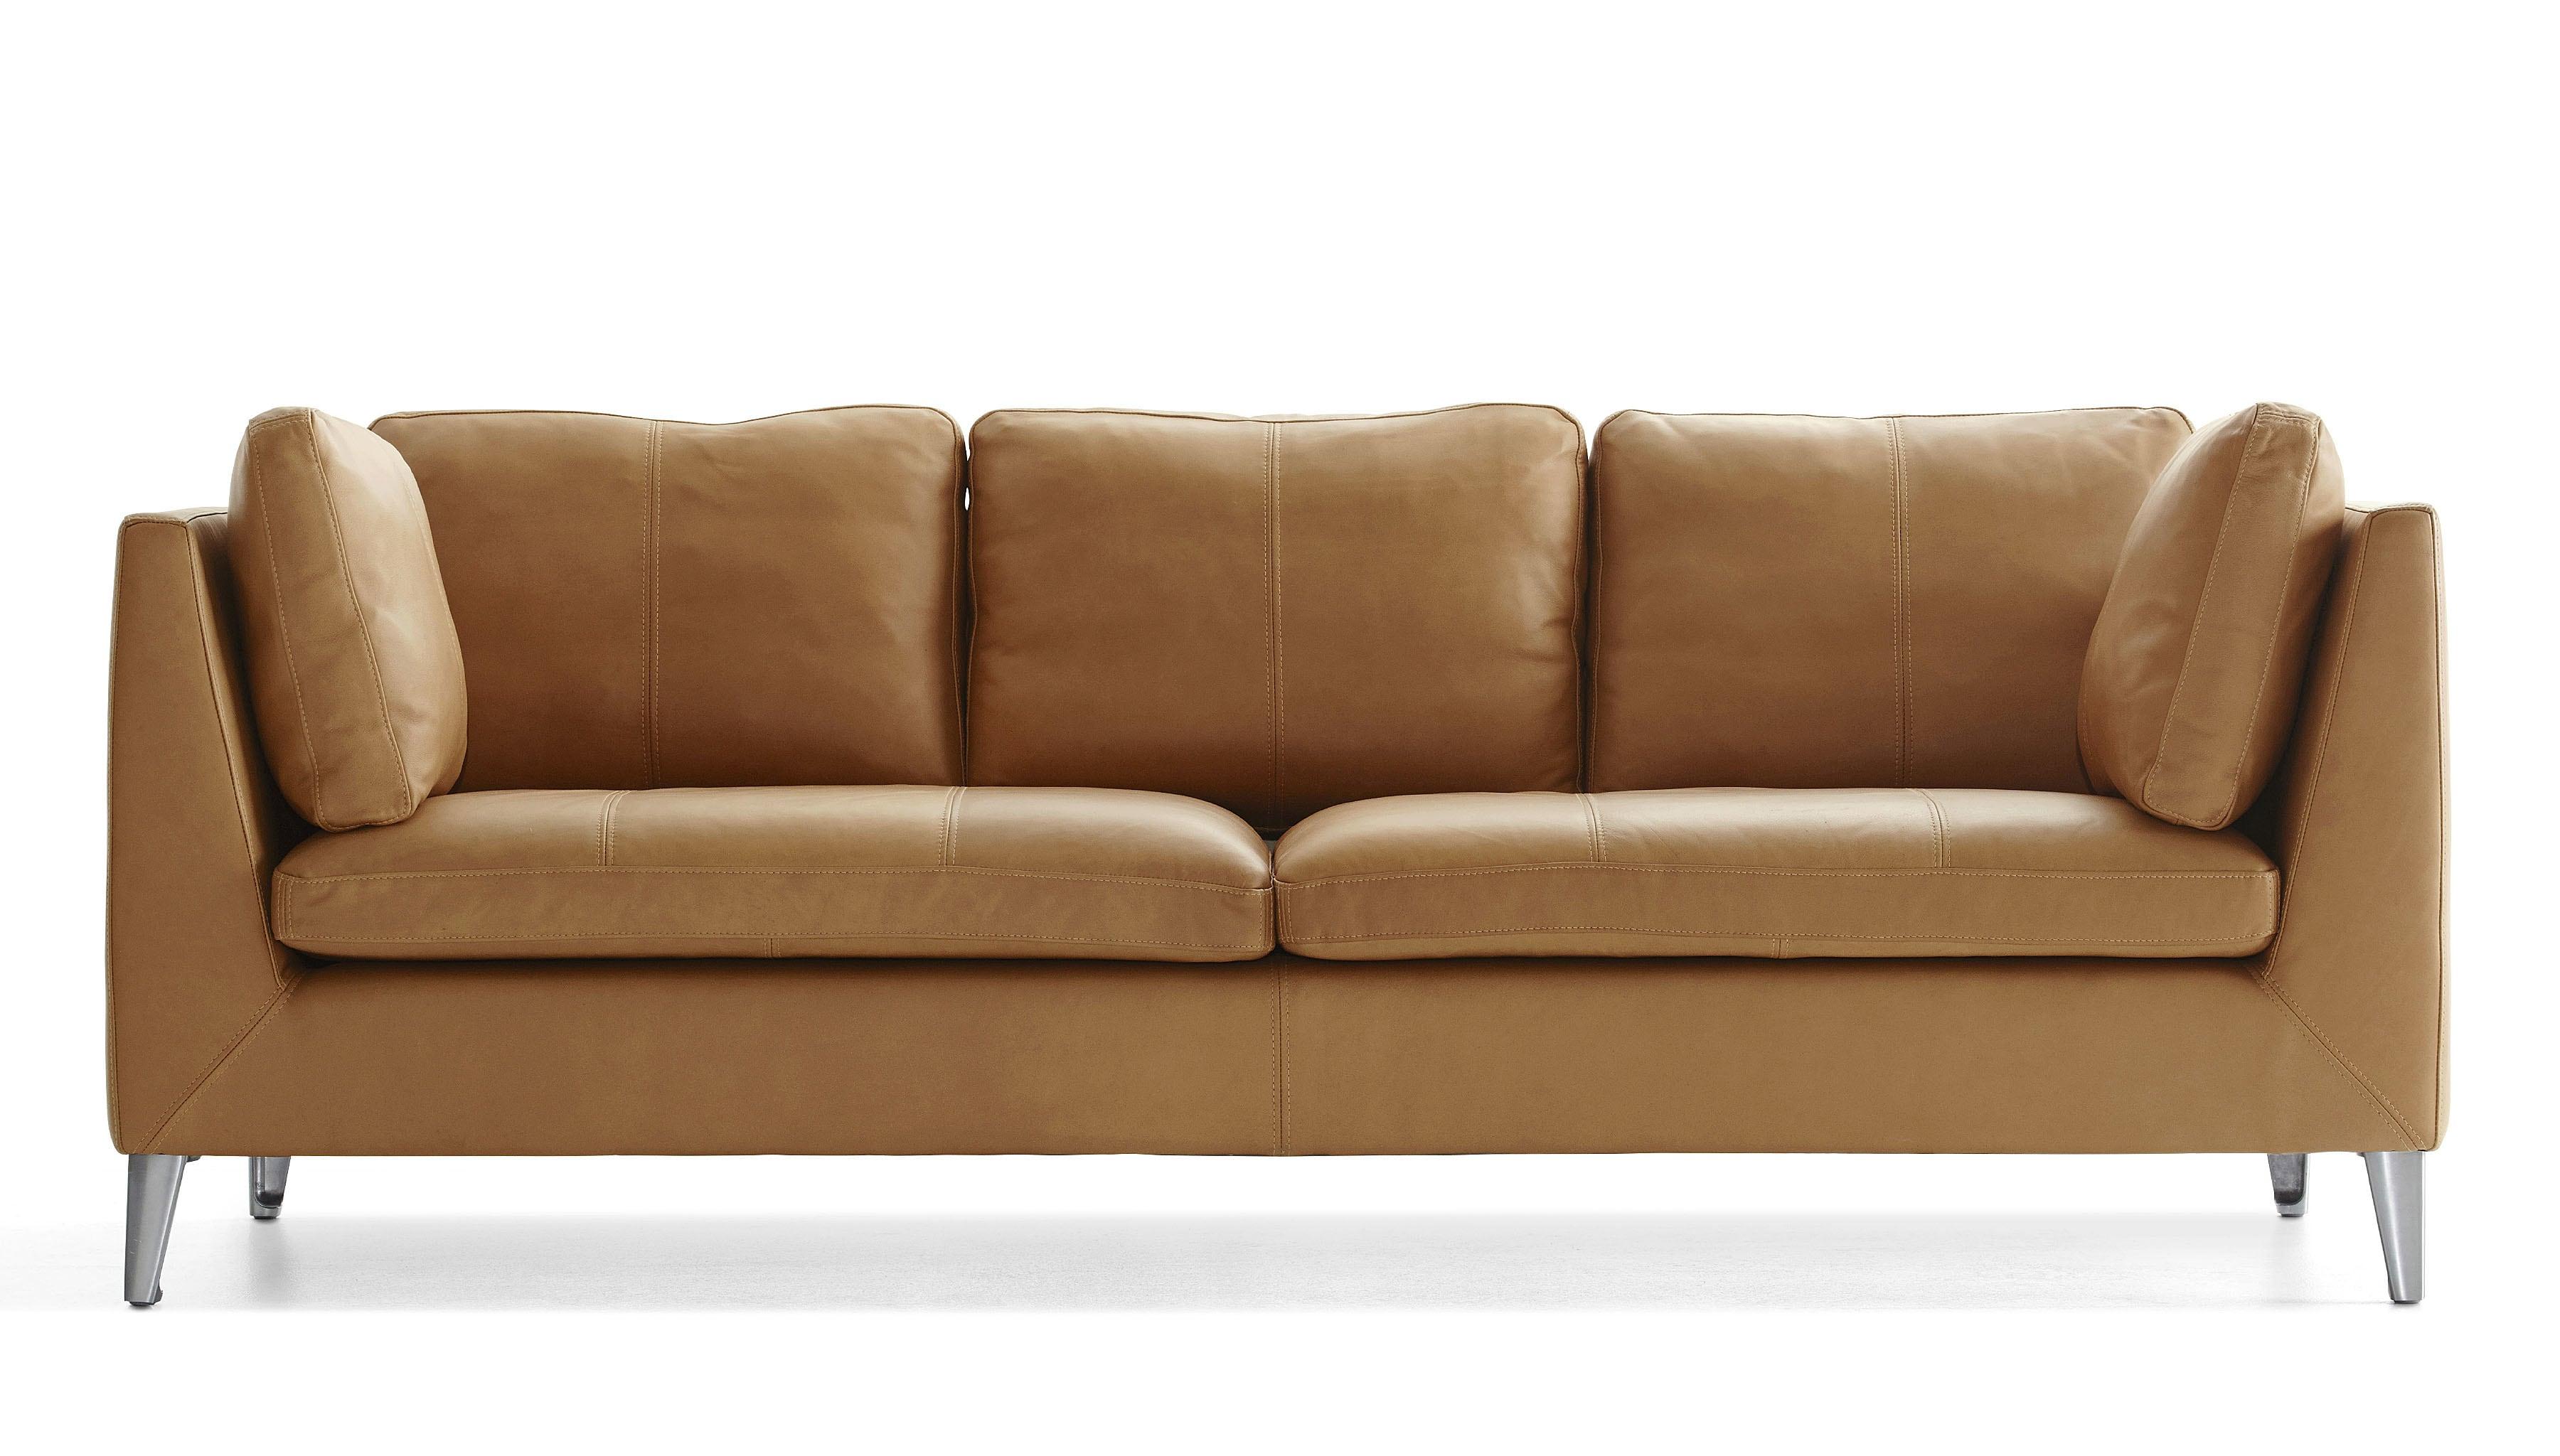 Sofas Baratos Ikea E9dx sofà S Y Sillones Pra Online Ikea